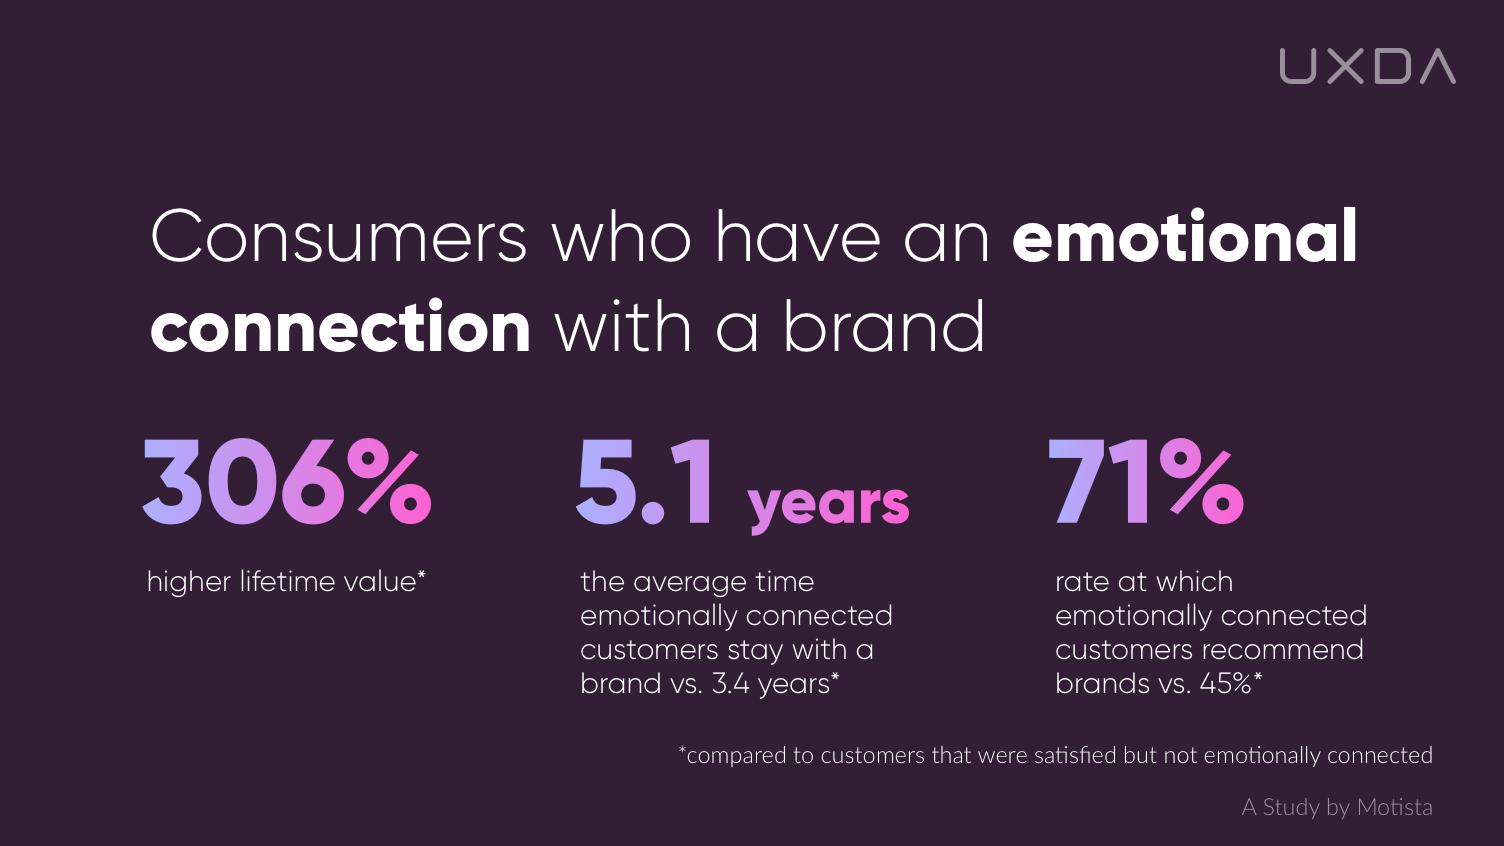 digital-banking-customer-experience-trends-5.jpg